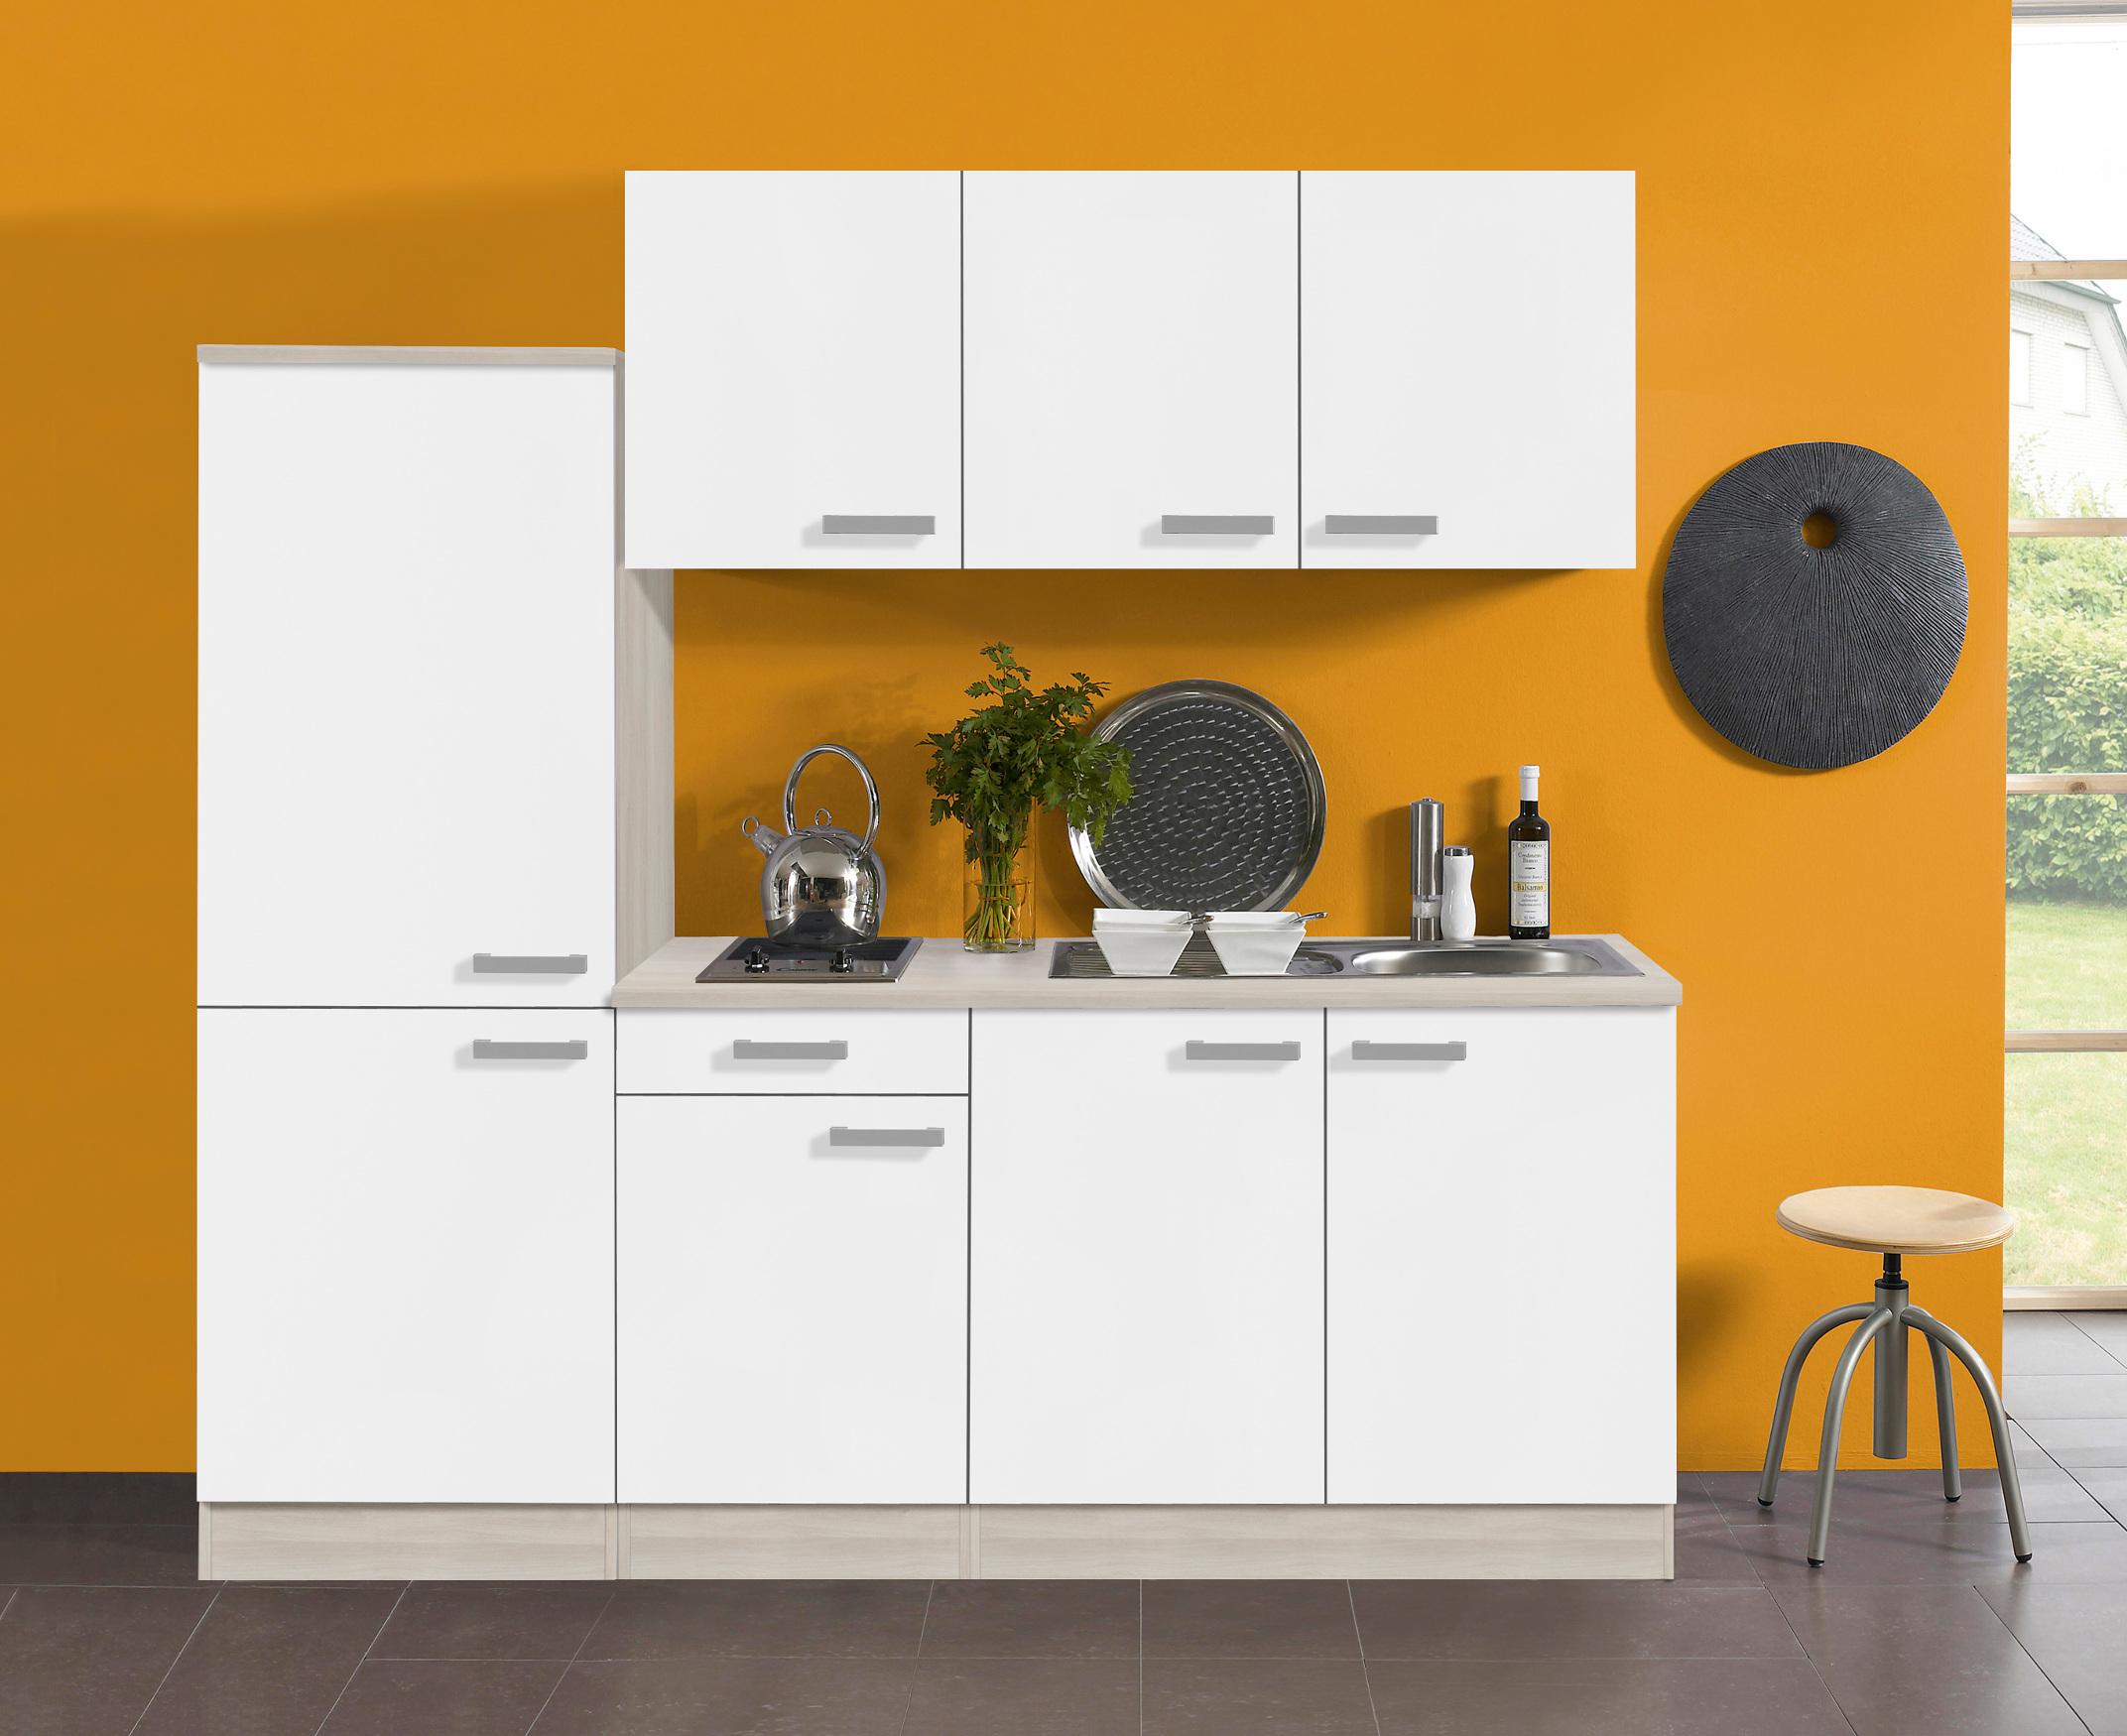 singlek che barcelona vario 2 glaskeramik 9 teilig breite 210 cm wei k che singlek chen. Black Bedroom Furniture Sets. Home Design Ideas